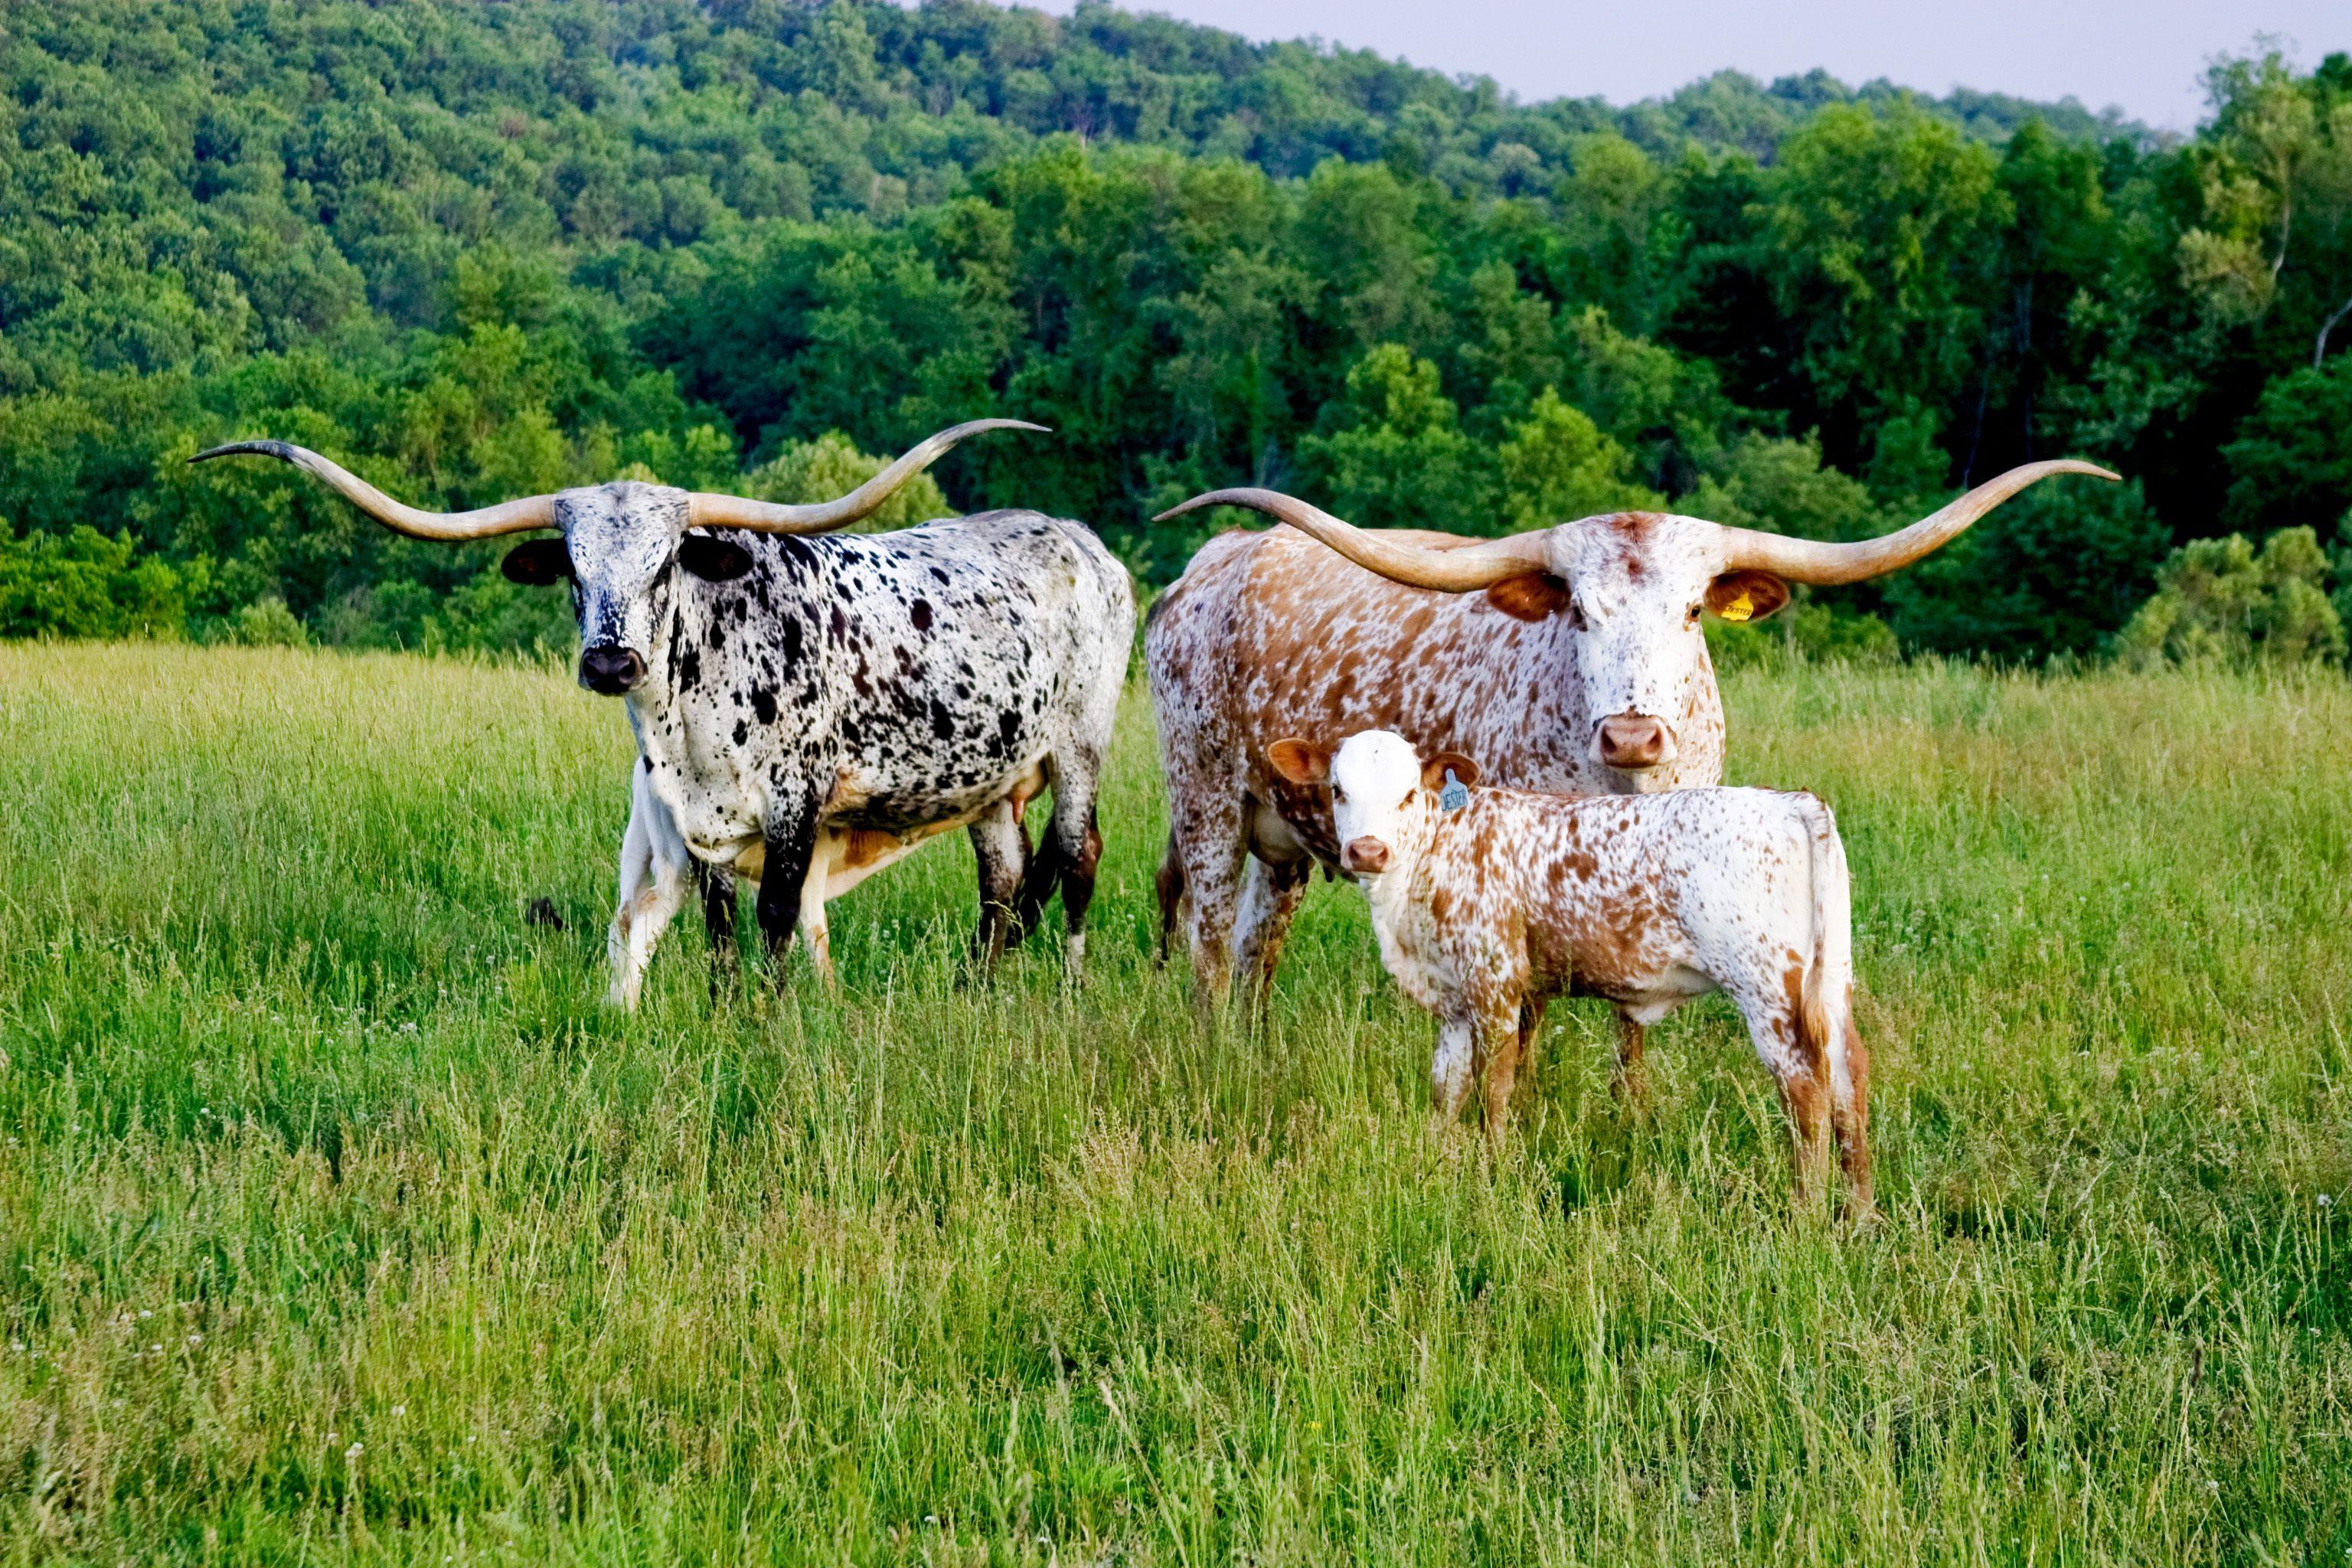 Elbertdouglas County Livestock Association